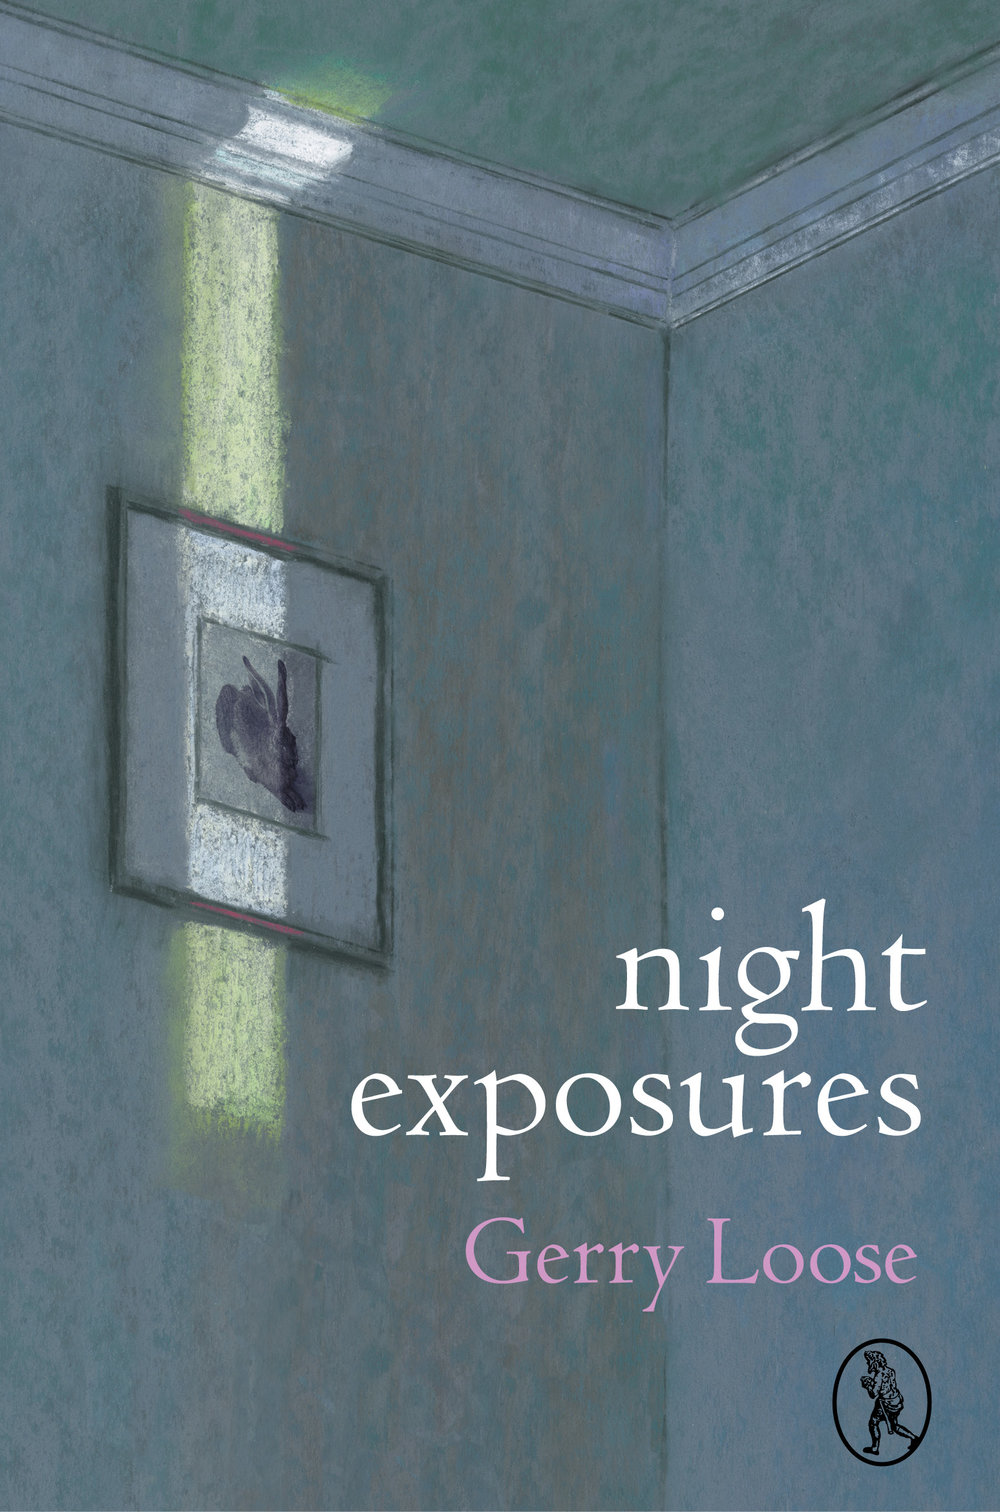 night exposures